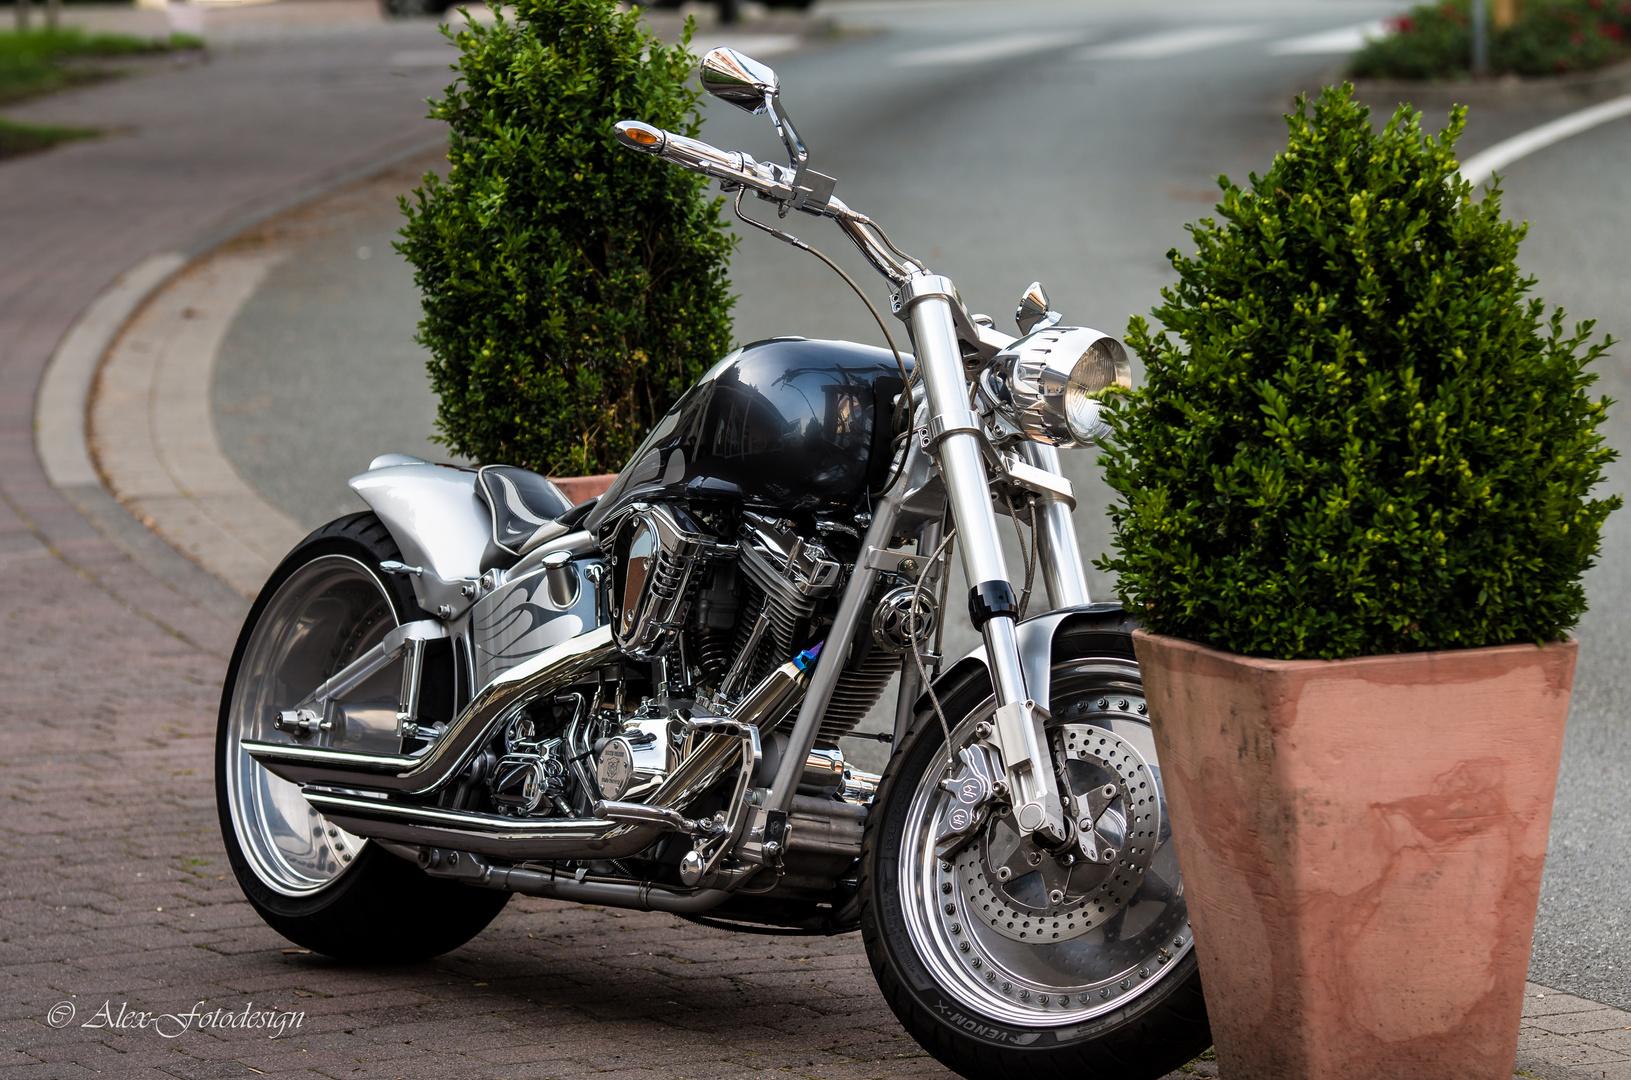 Wunderschönes Motorrad